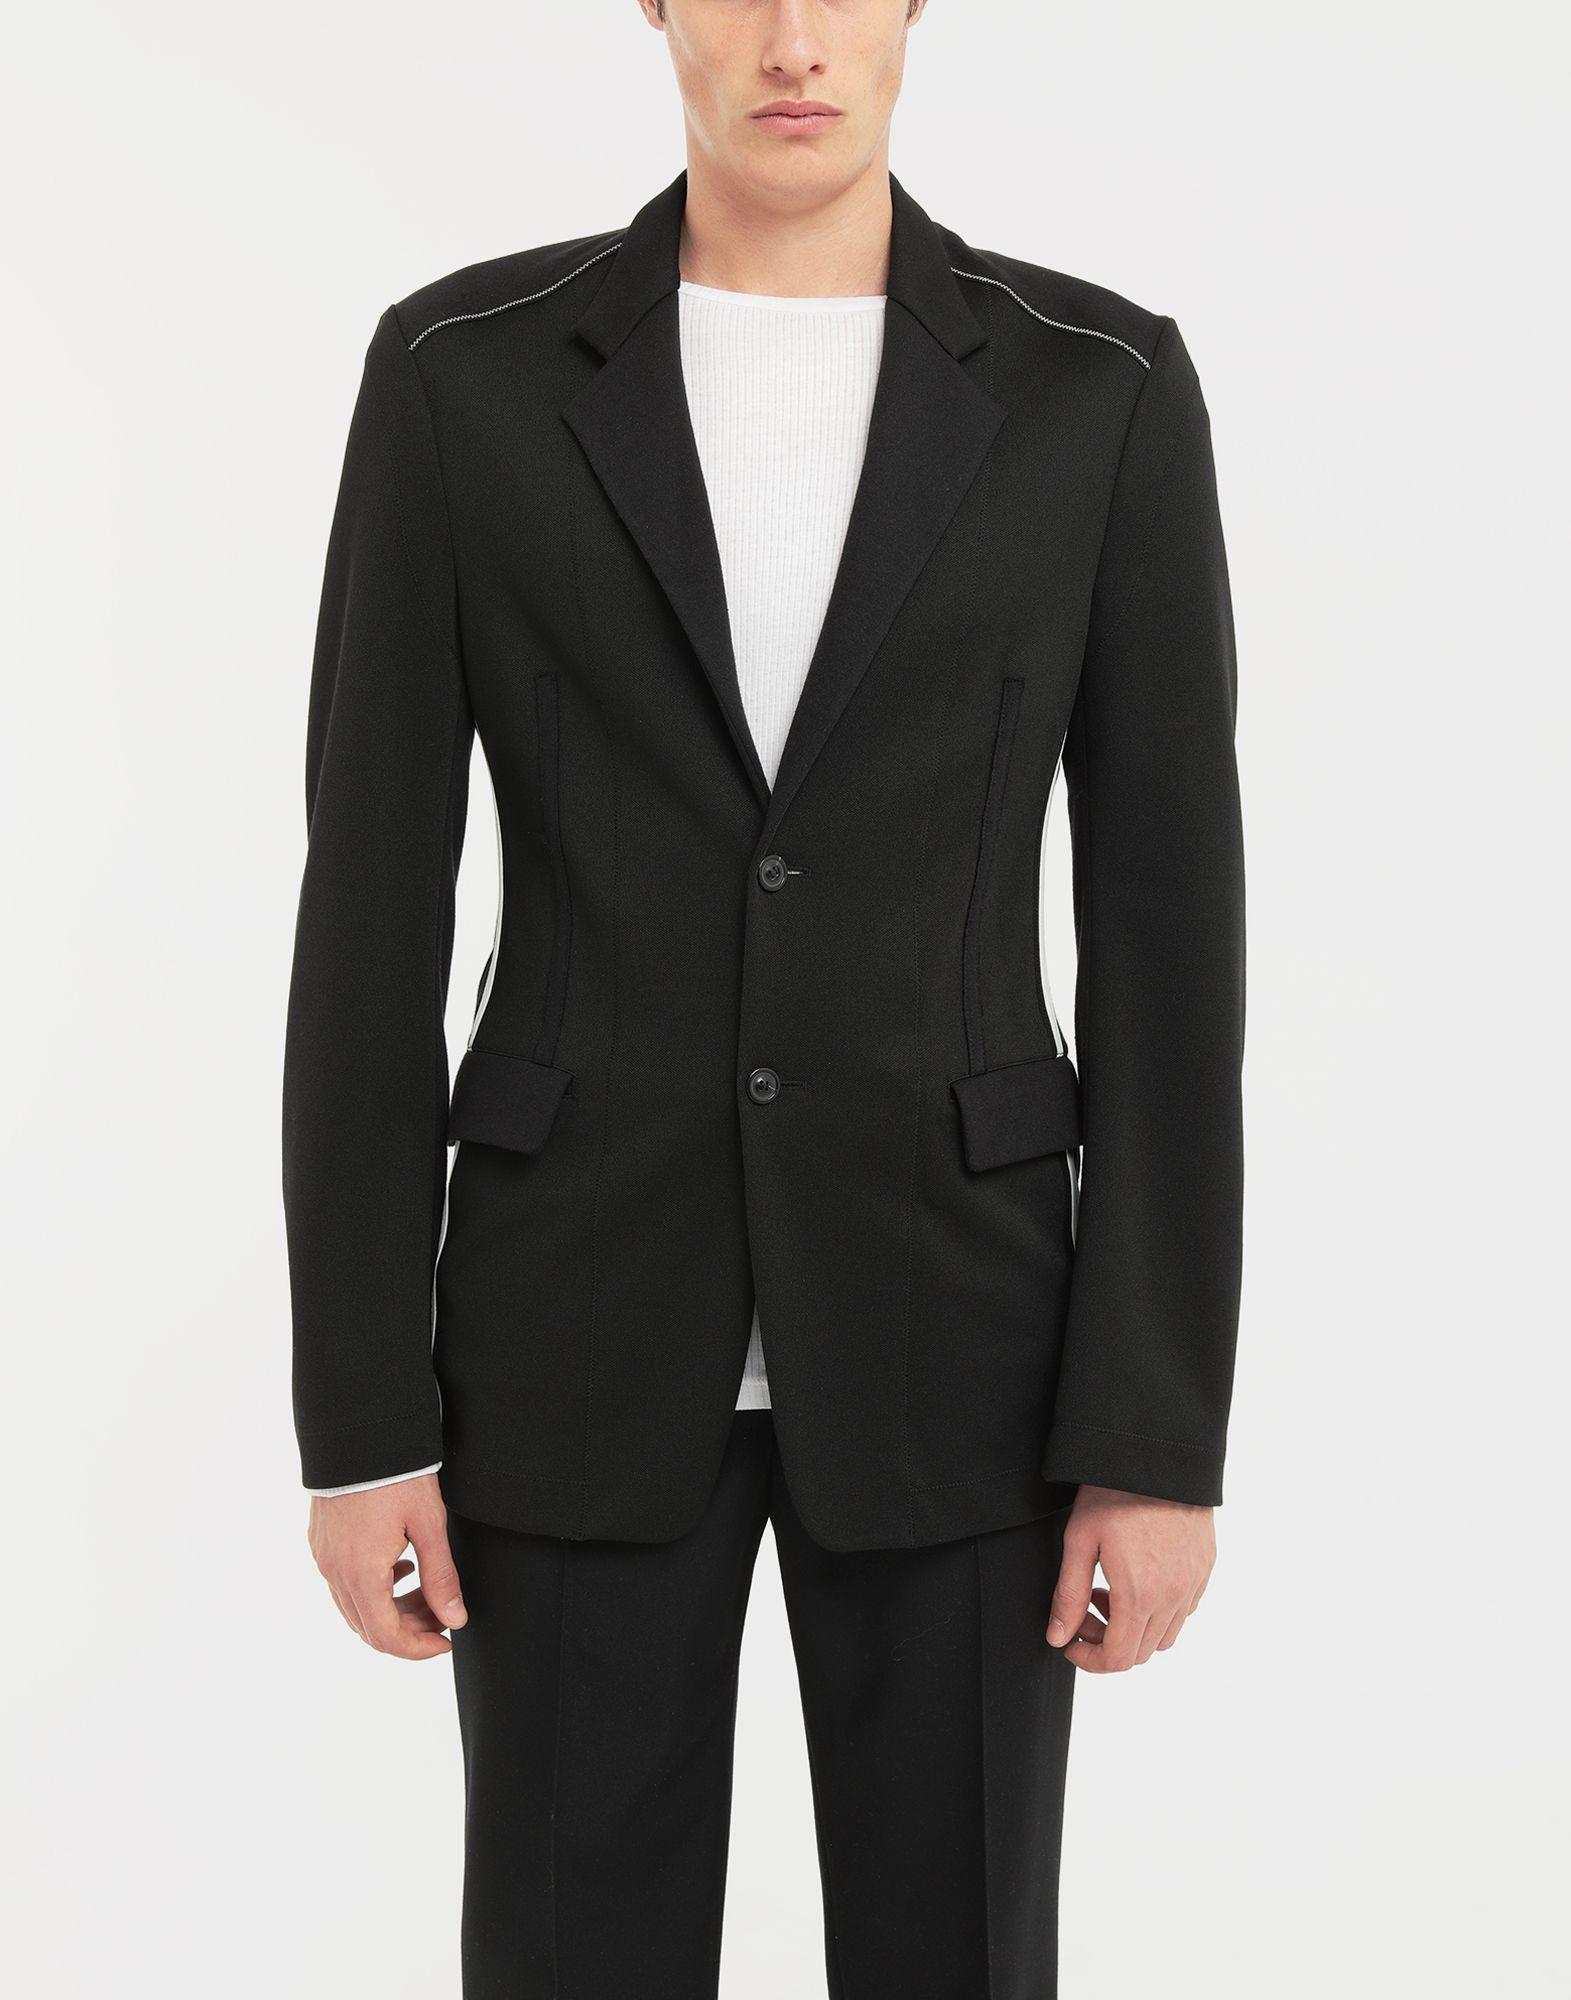 MAISON MARGIELA Exposed seam jersey jacket Blazer Man r